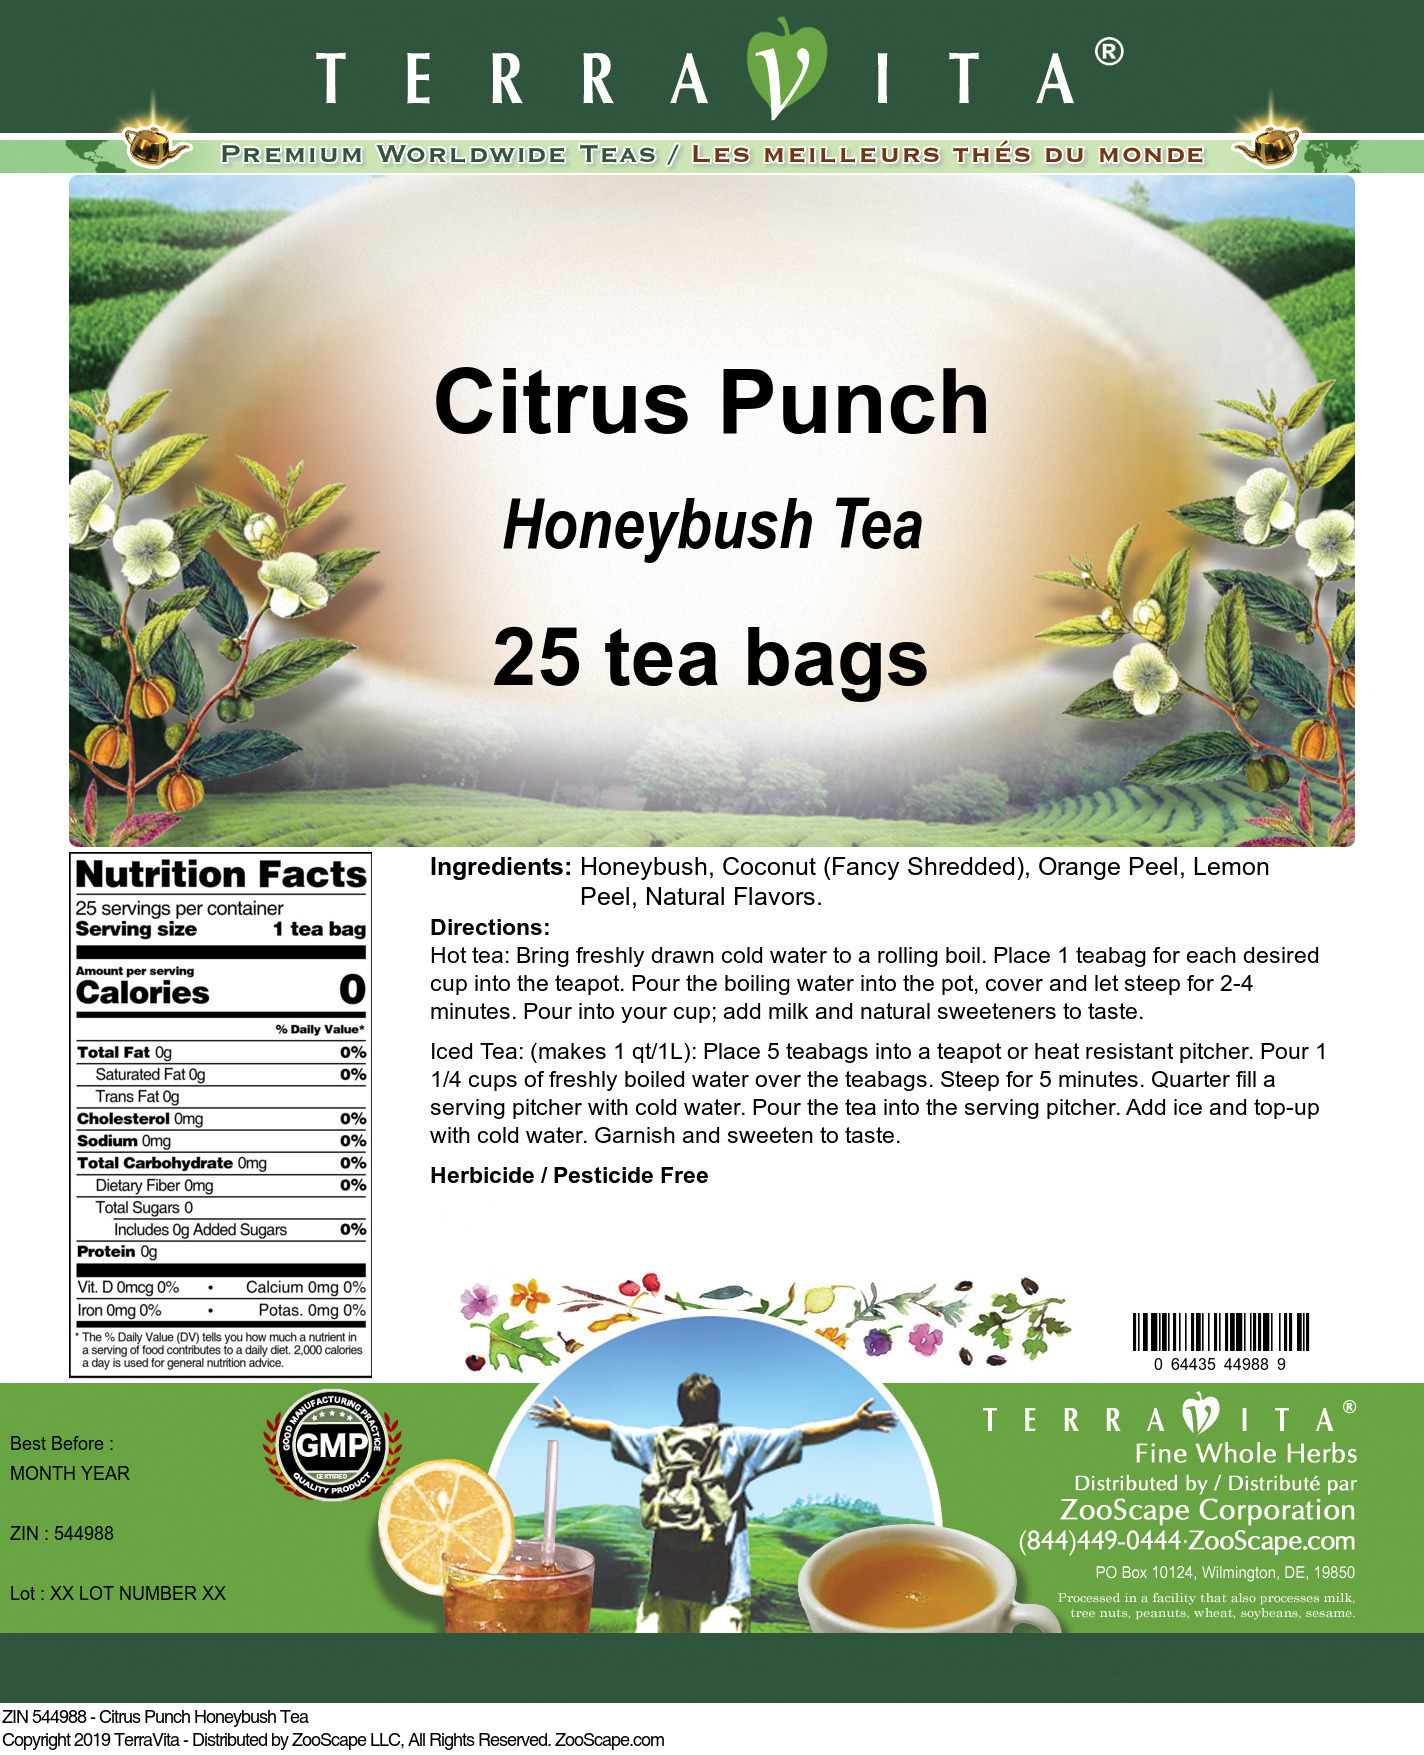 Citrus Punch Honeybush Tea